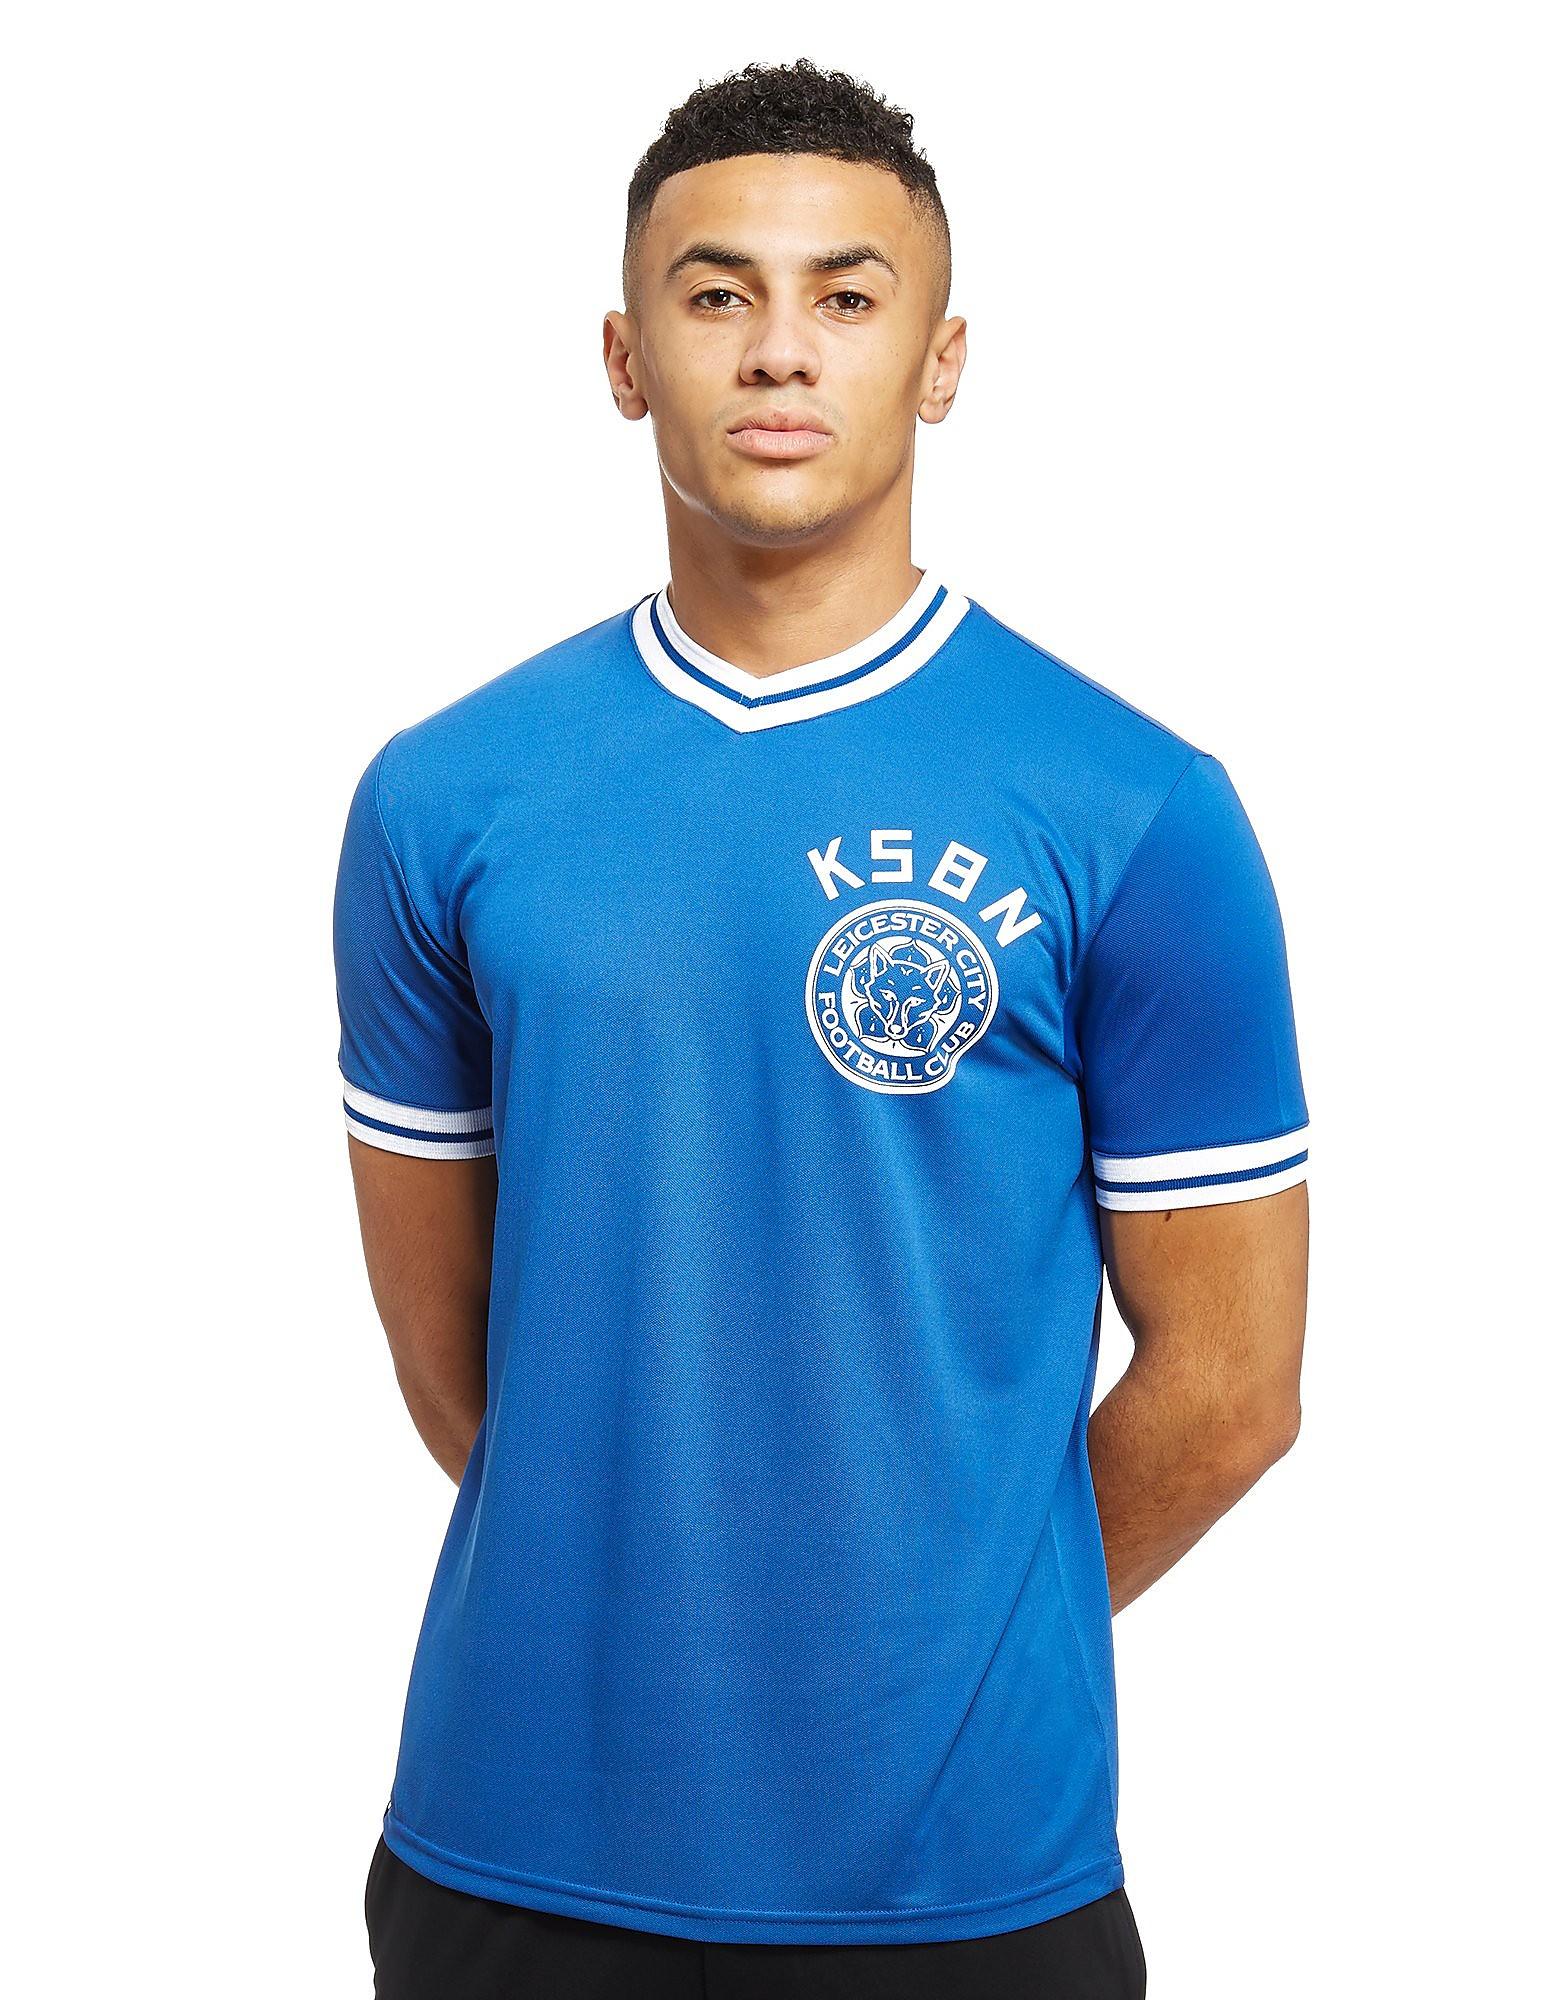 Official Team Official Leicester City Kasabian T-Shirt